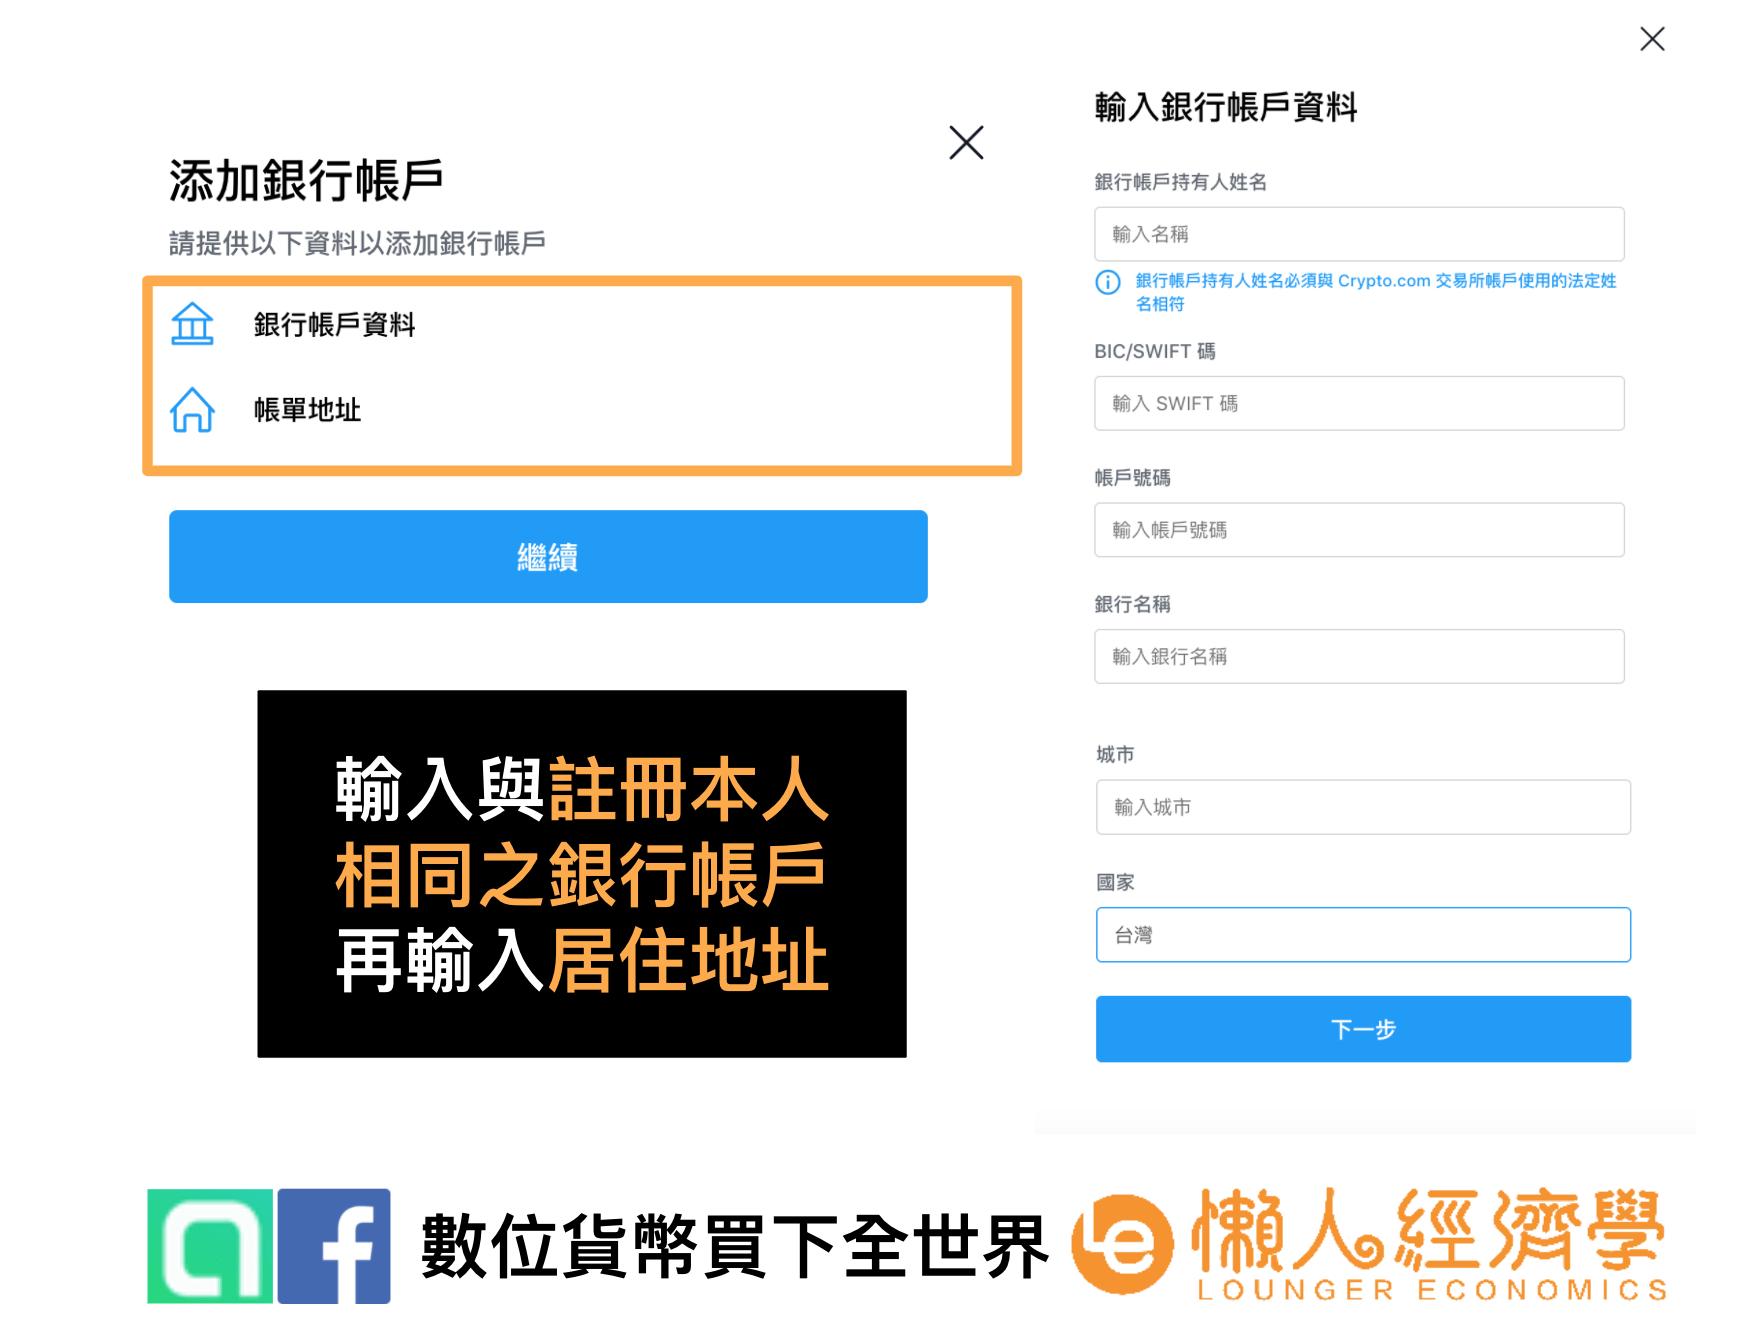 Crypto.com法幣帳戶開通教學STEP 2.輸入你的銀行帳戶資料及住址資料